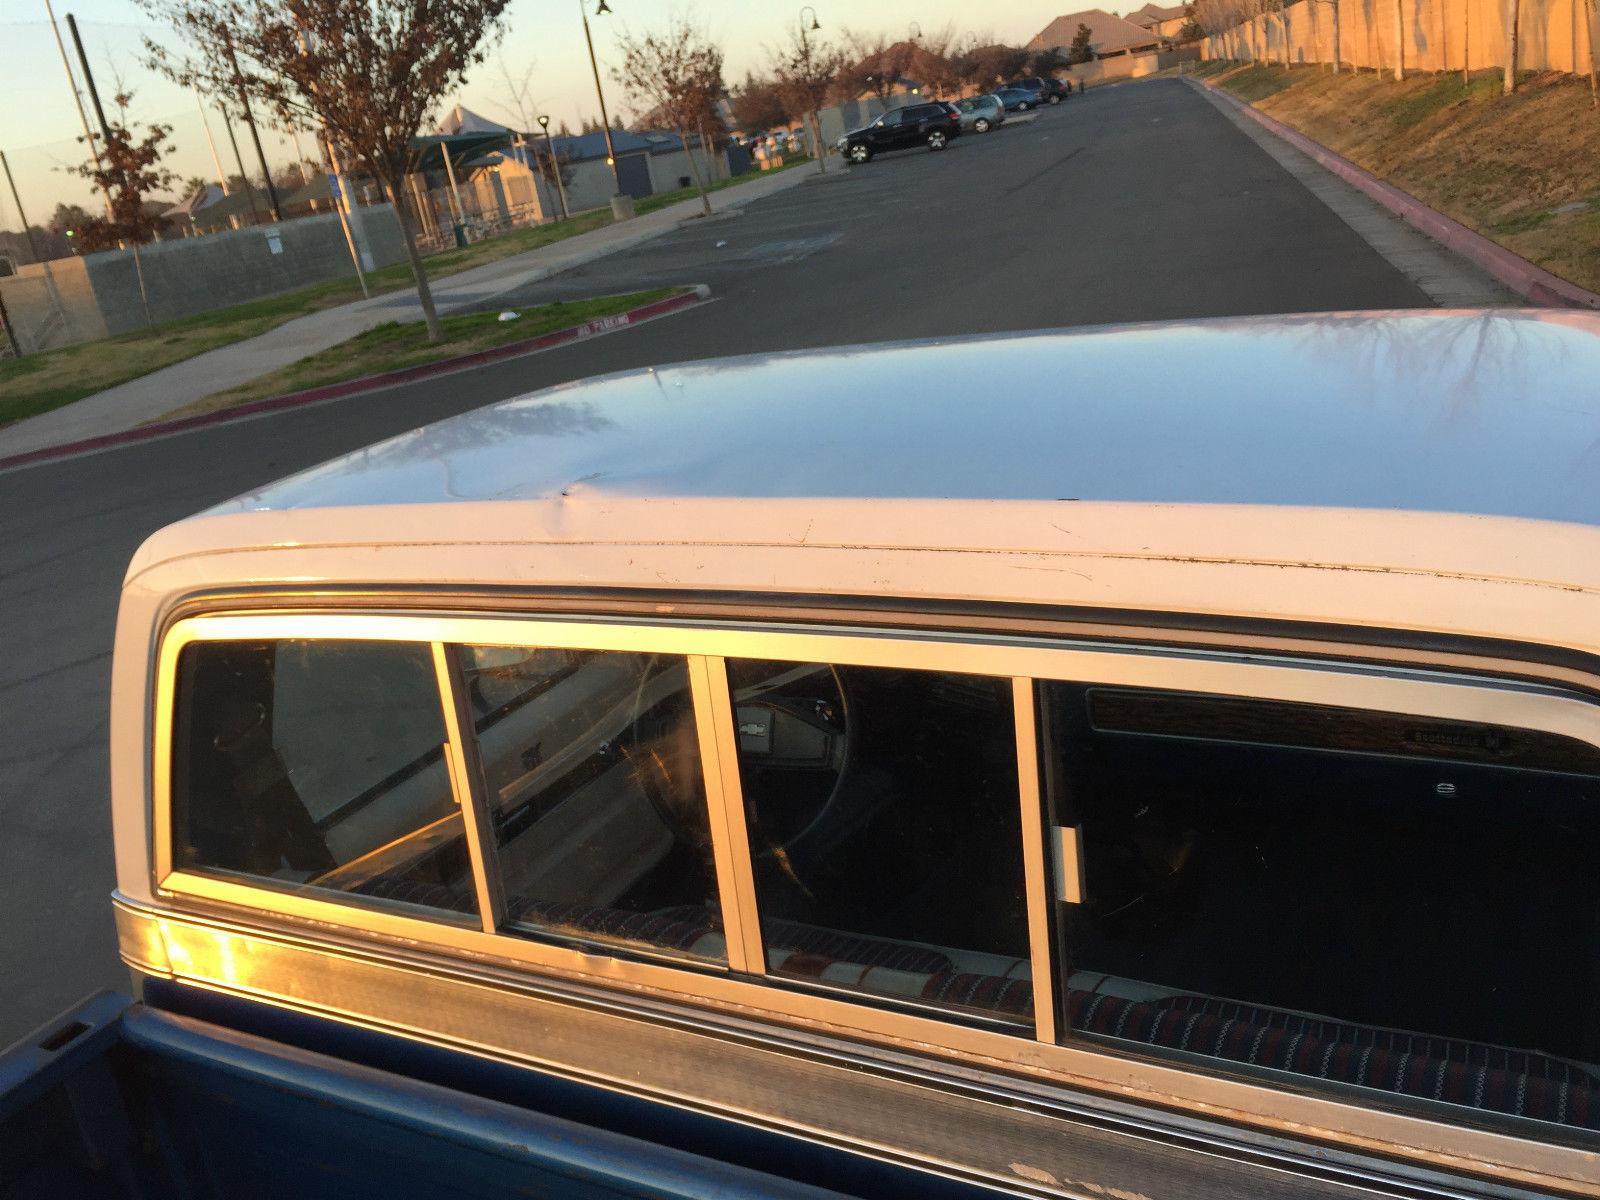 1976 C10 Chevy Spirit Of 76 Commemorative Edition Straight Original Truck